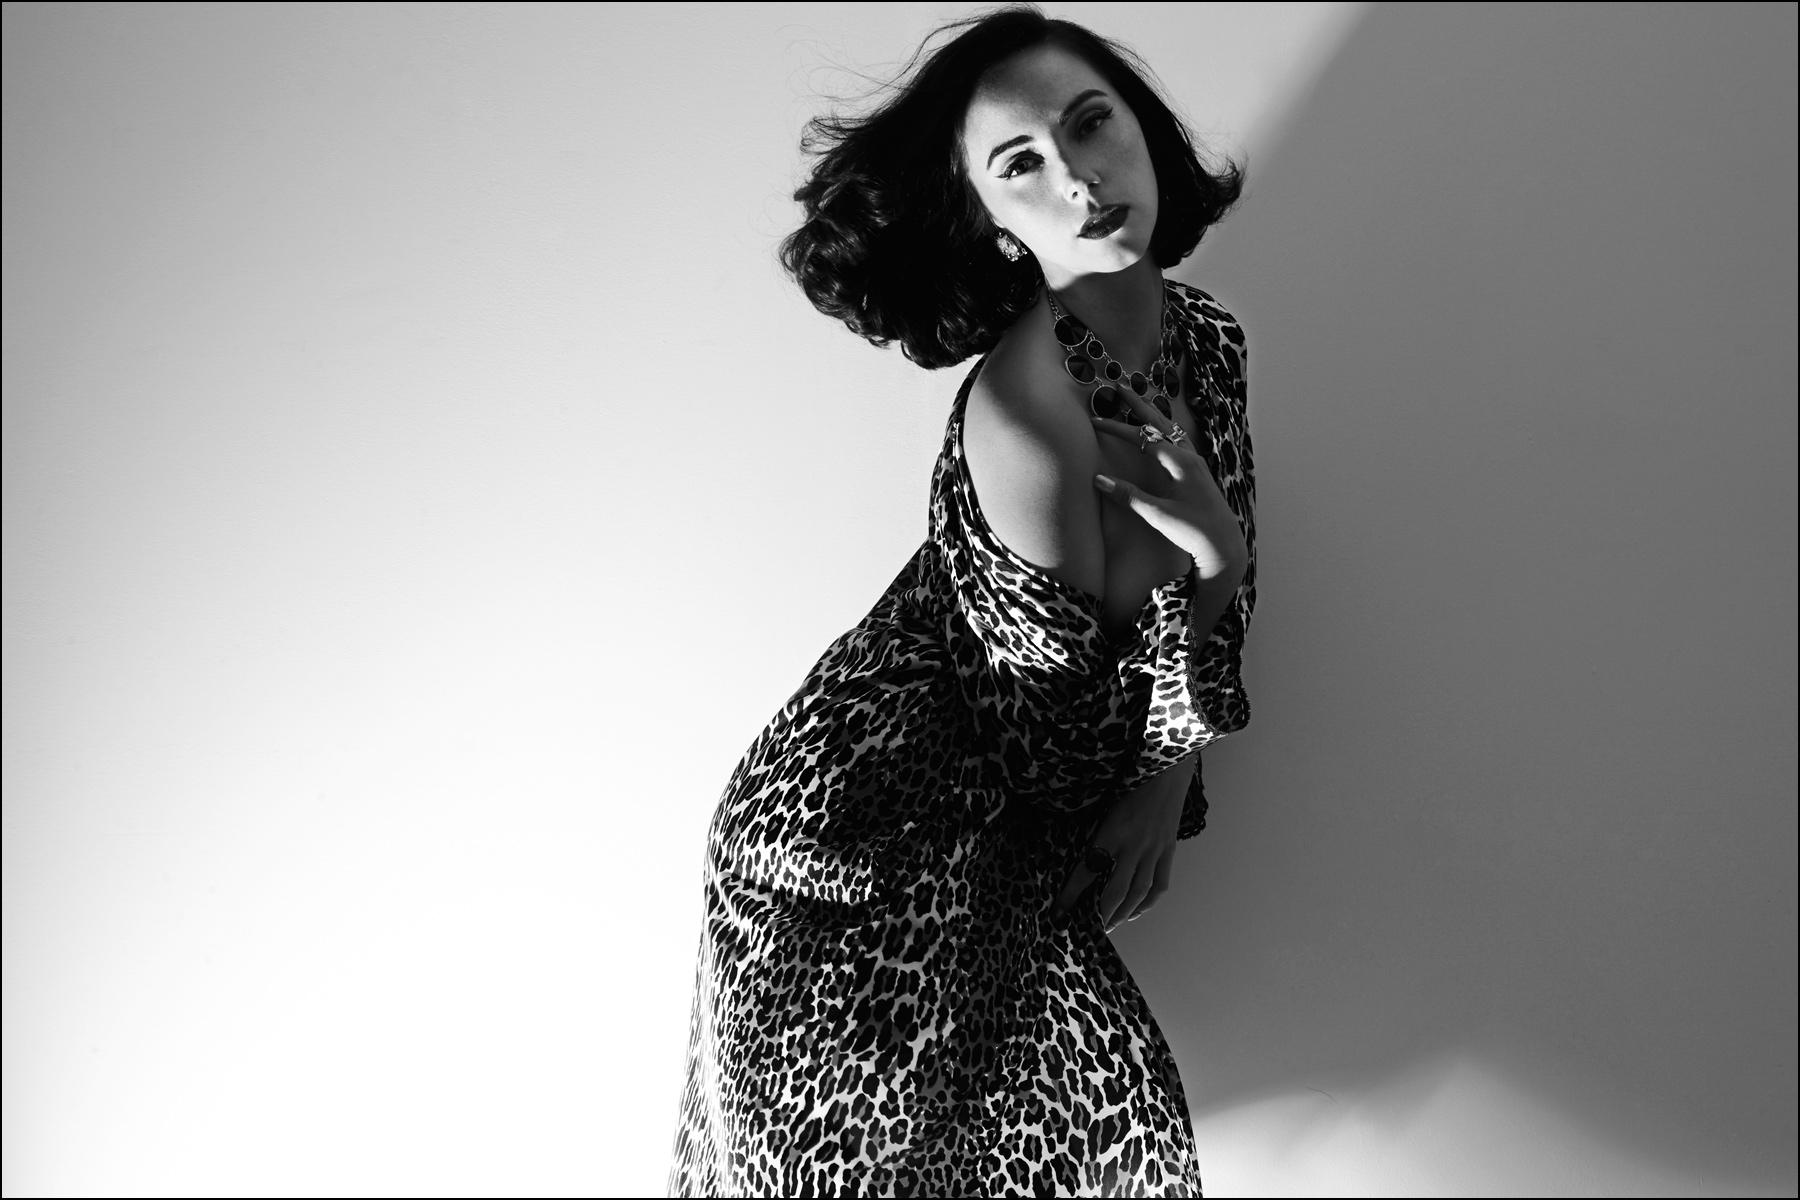 Musician & model Miss Kacie Marie